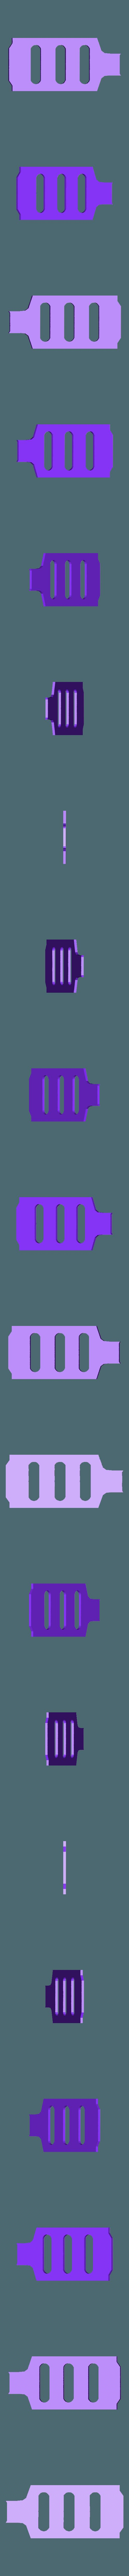 bridge.stl Download free STL file Foldable drone frame (Mavic look like, body & head alternative) Remix • 3D printer model, mwilmars